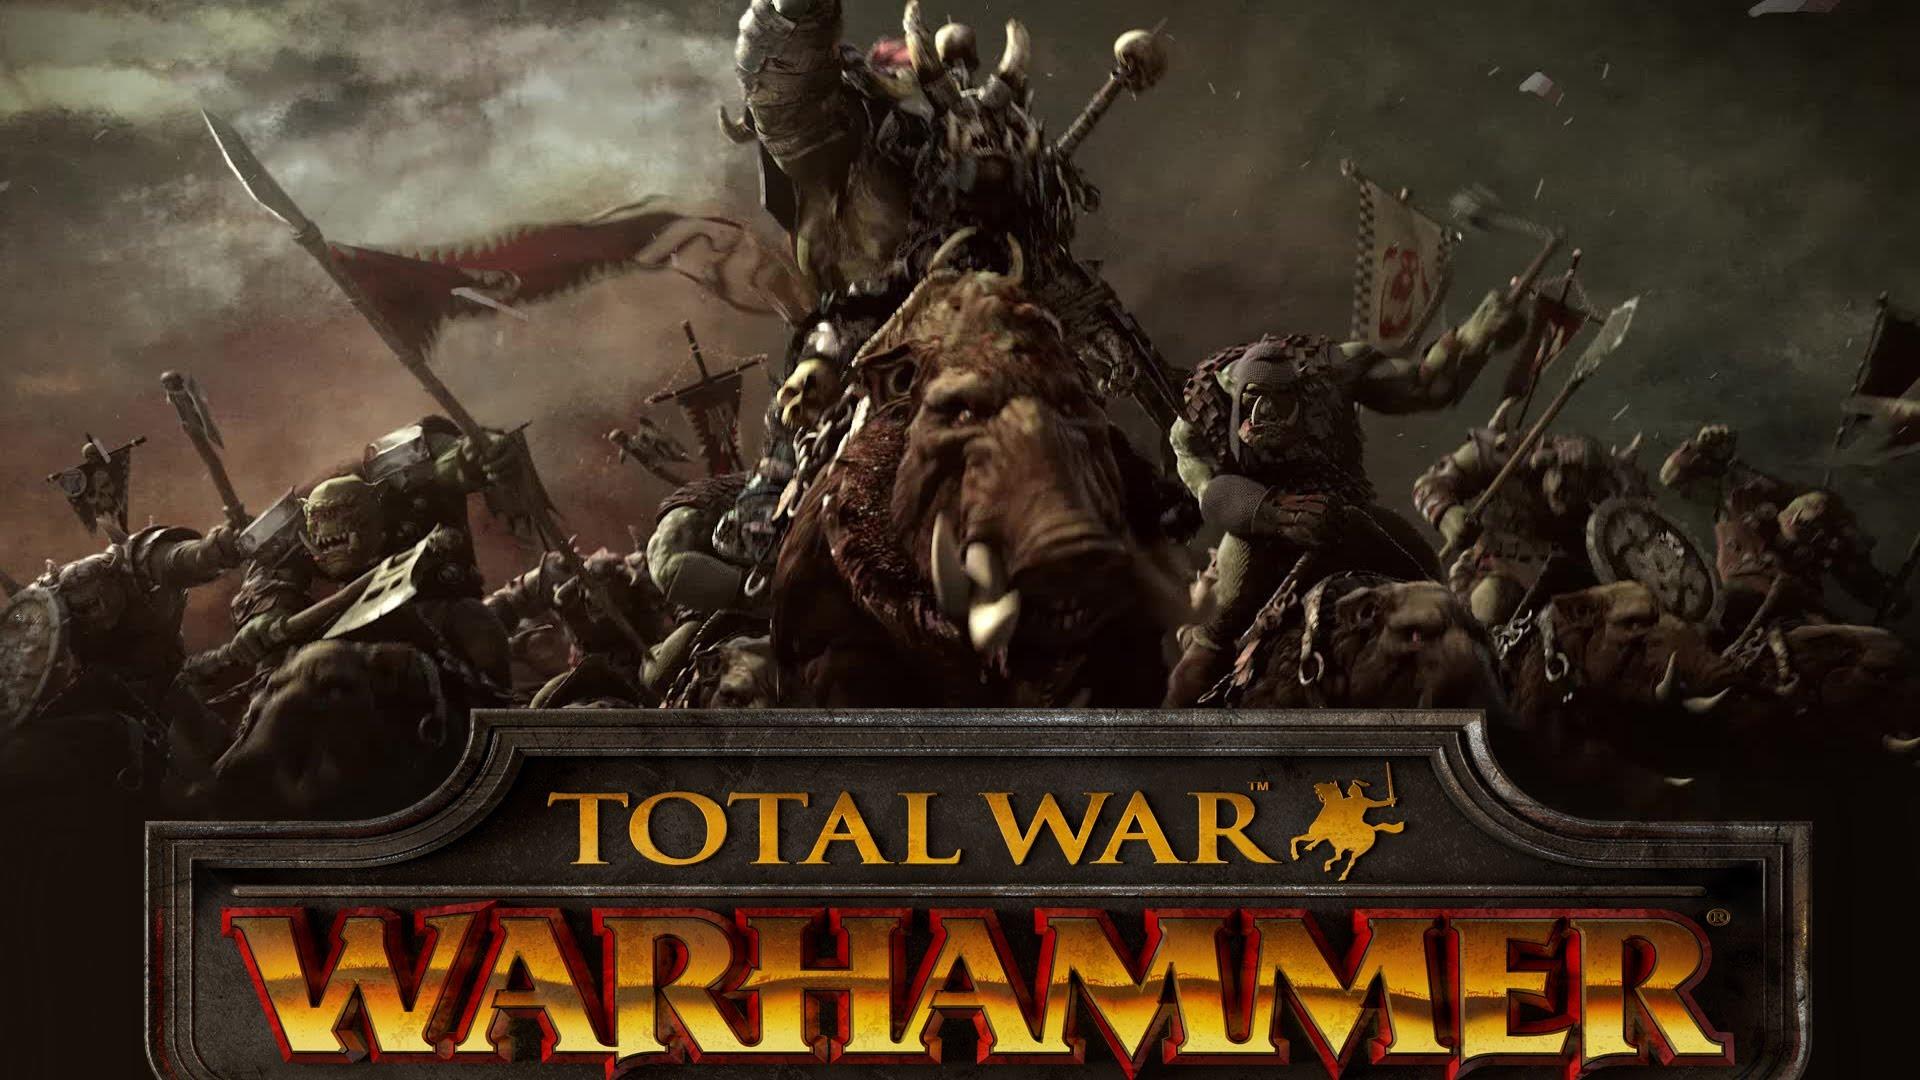 total war warhammer 2 optimization guide